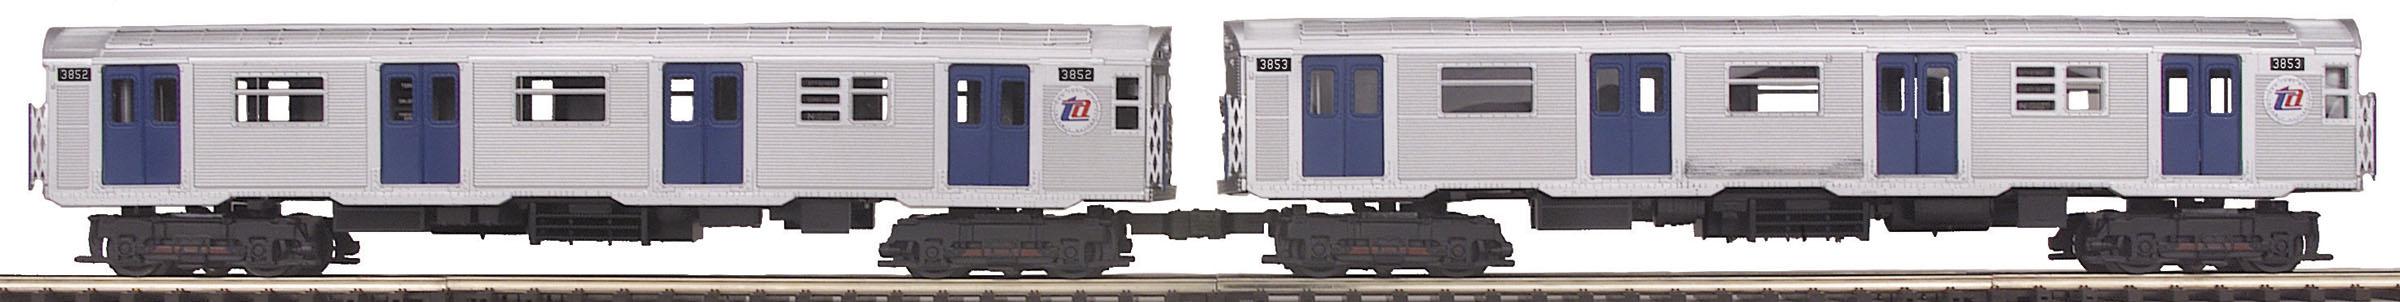 20 6637 mth electric trains. Black Bedroom Furniture Sets. Home Design Ideas